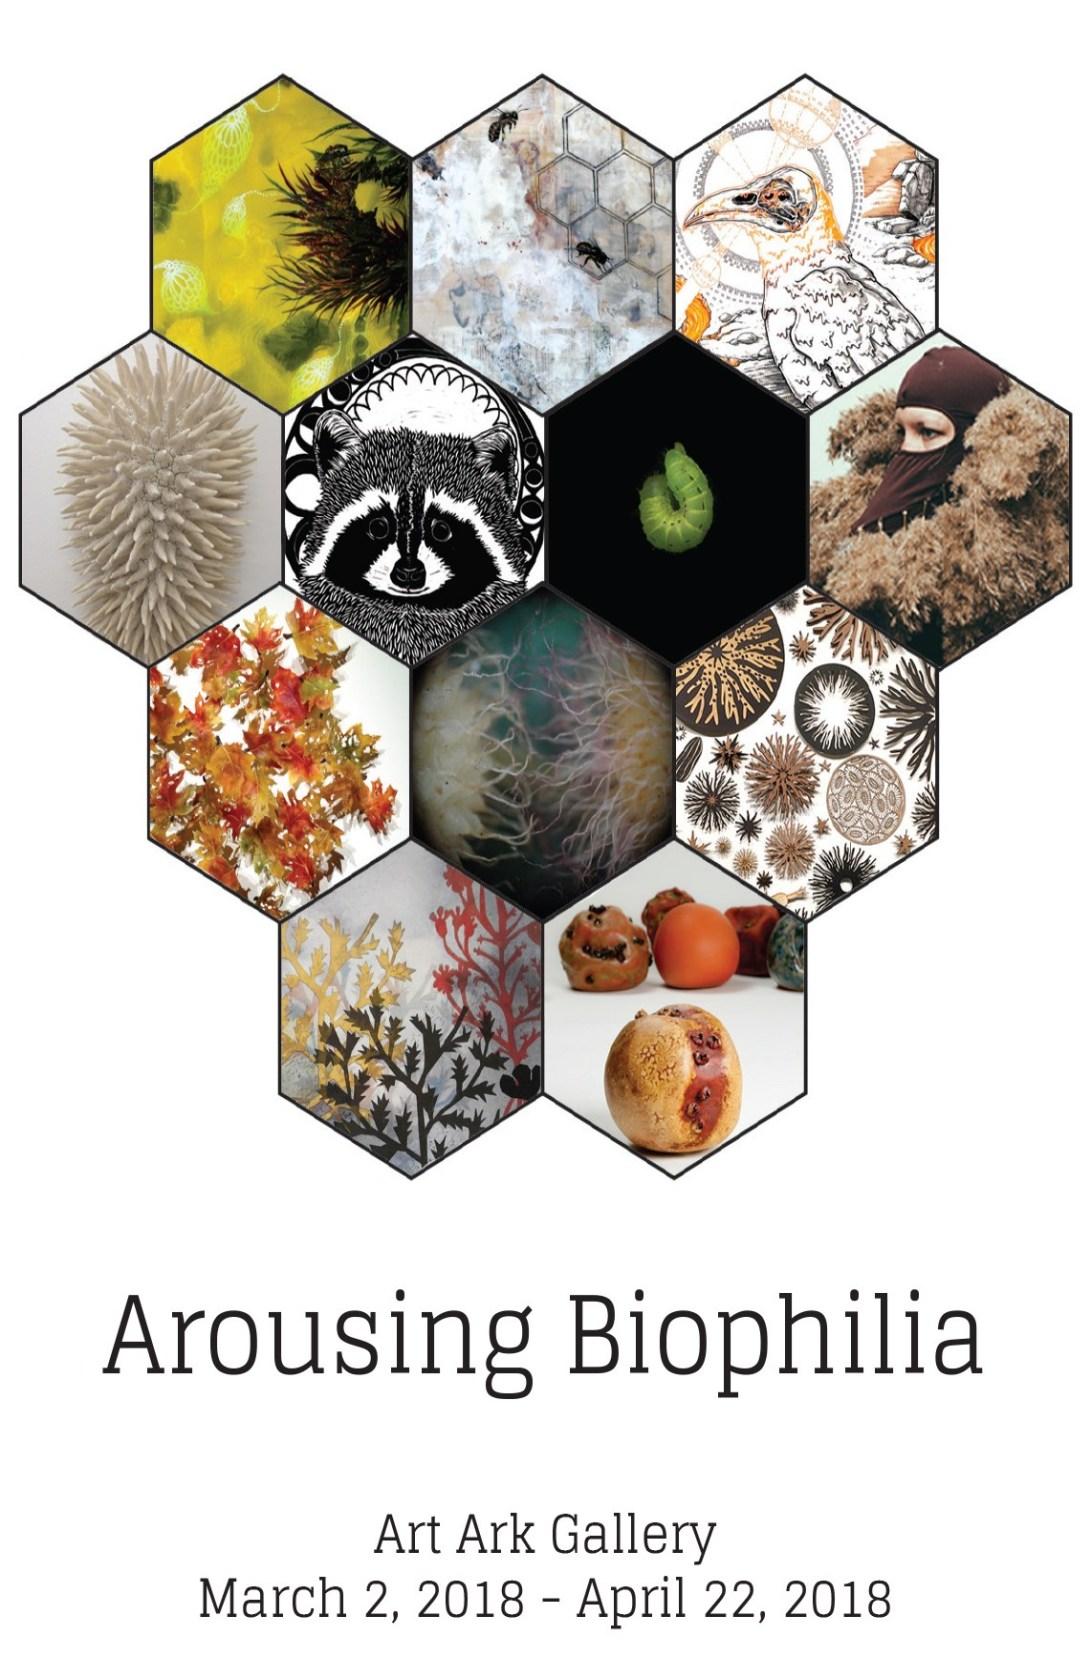 Arousing-Biophilia-Postcard-Front.jpg